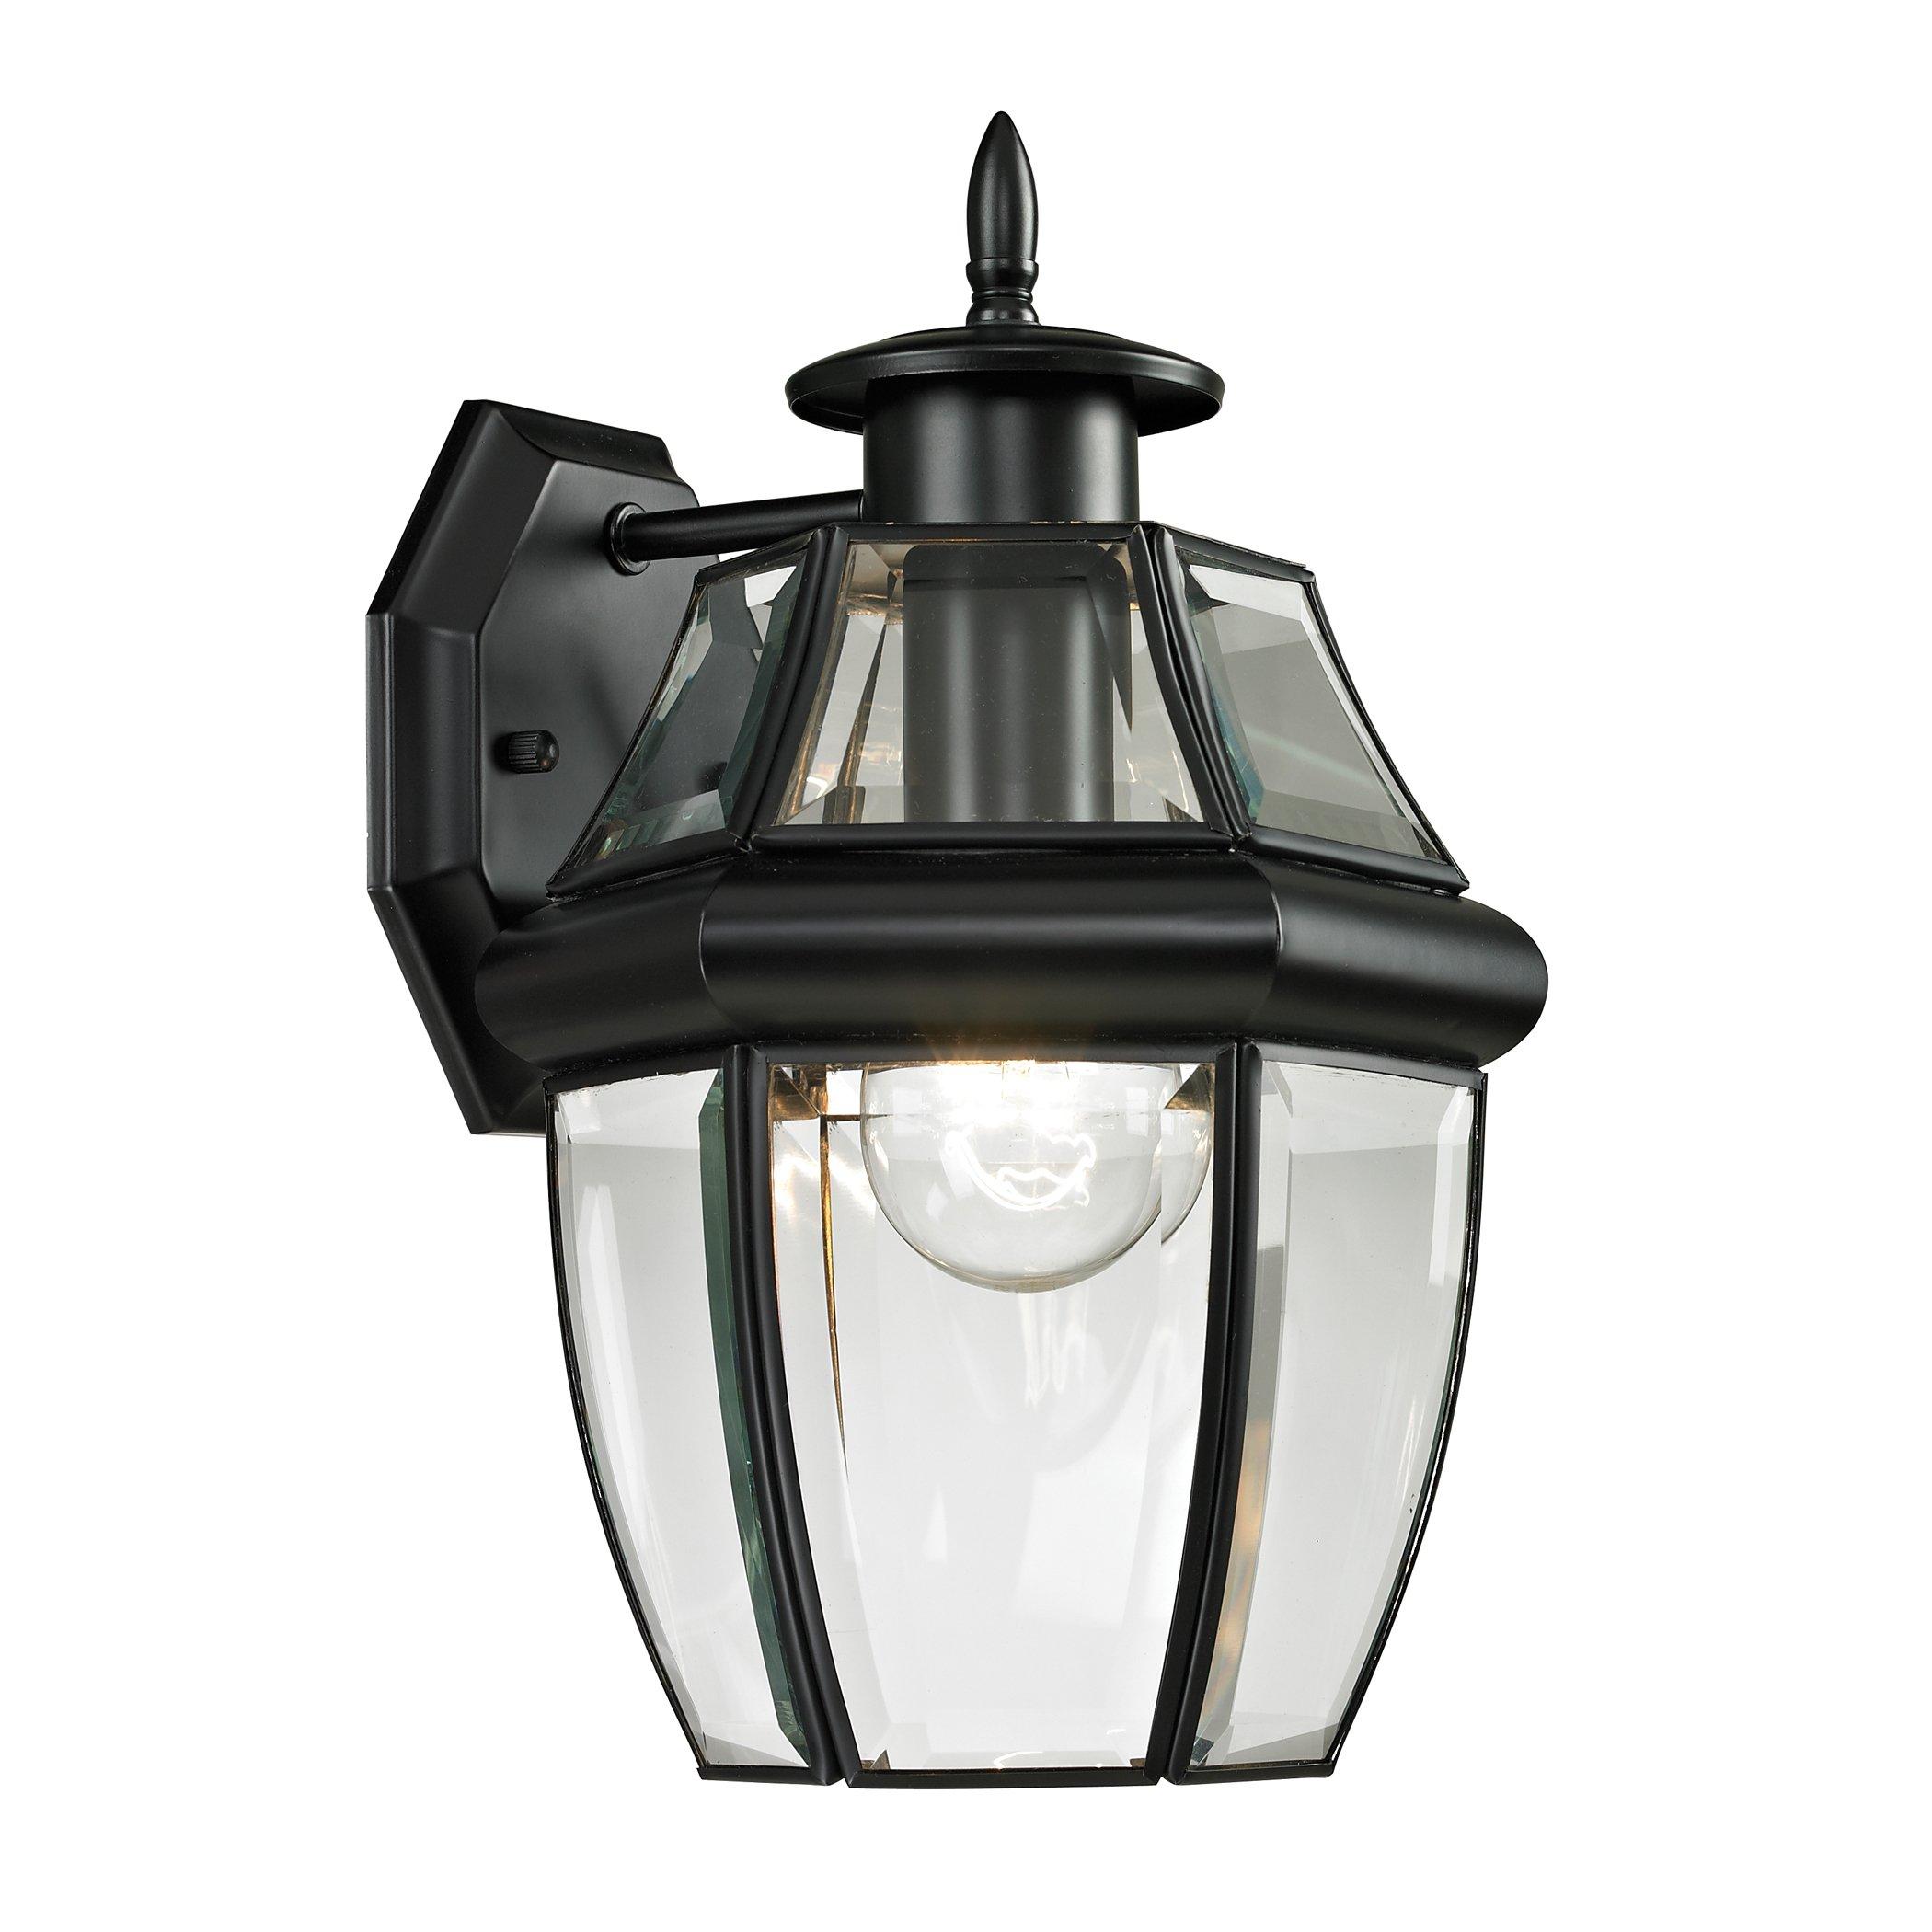 Cornerstone Lighting 8601EW/60 Ashford 1 Light Exterior Coach Lantern, Black